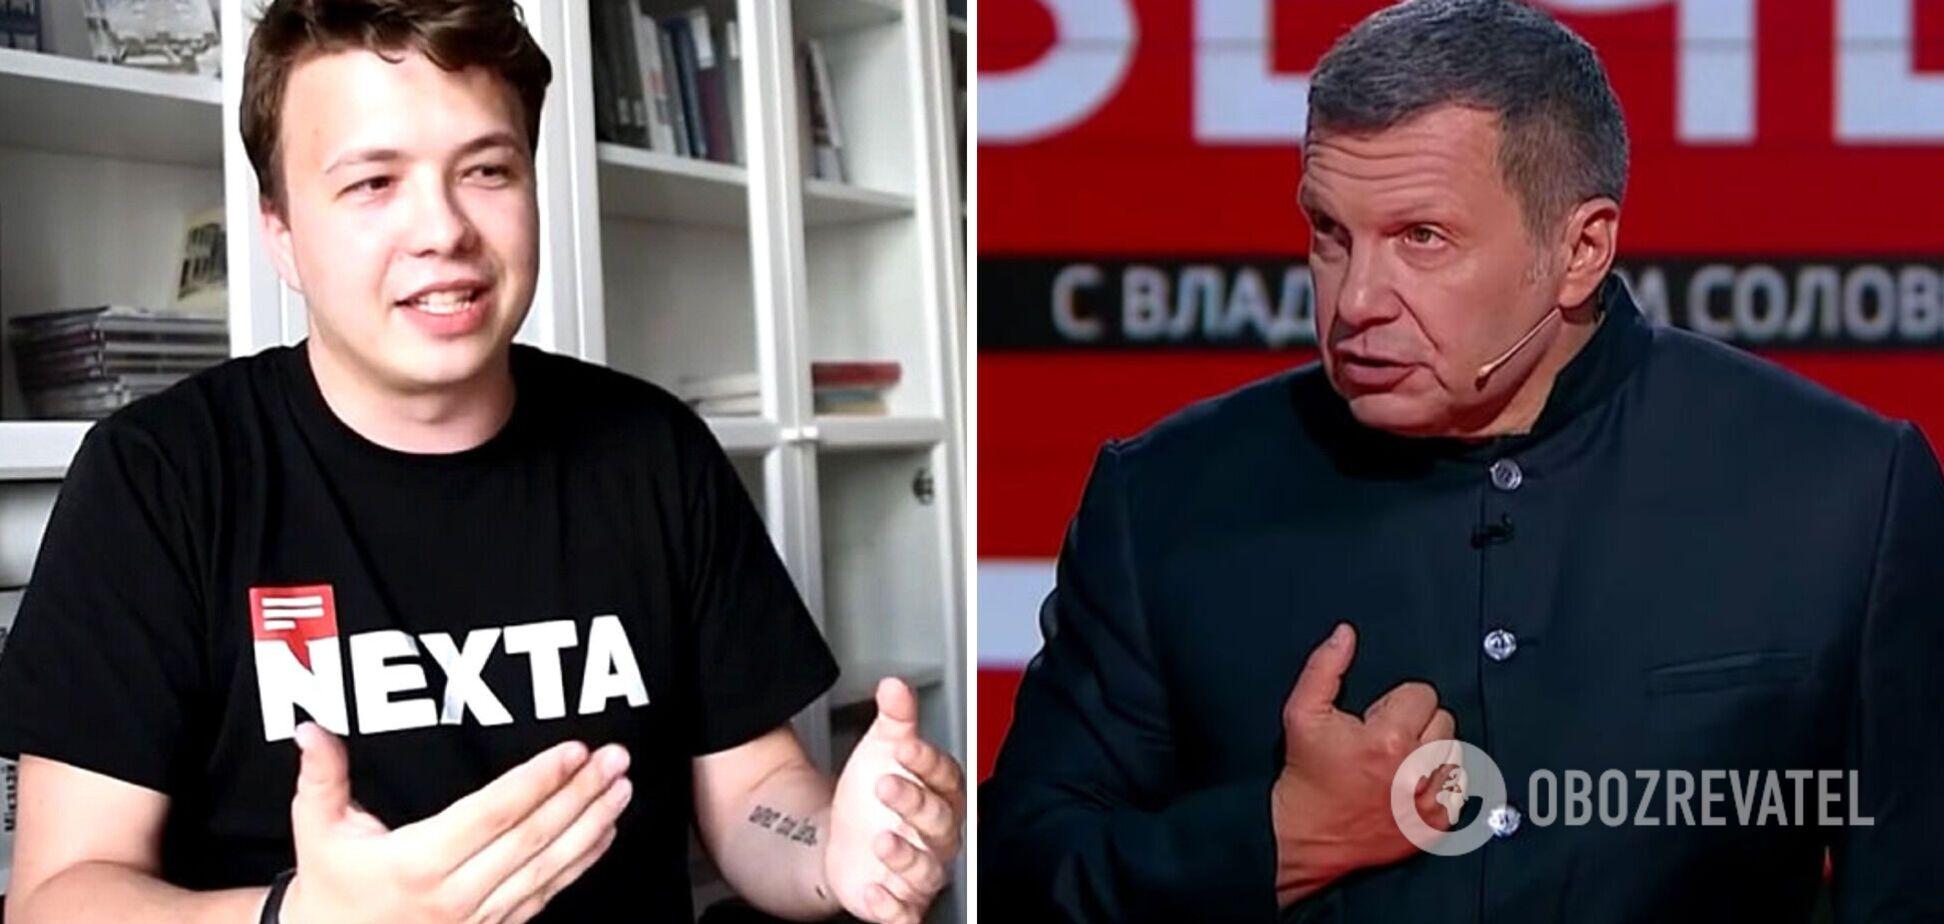 Роман Протасевич и Владимир Соловьев